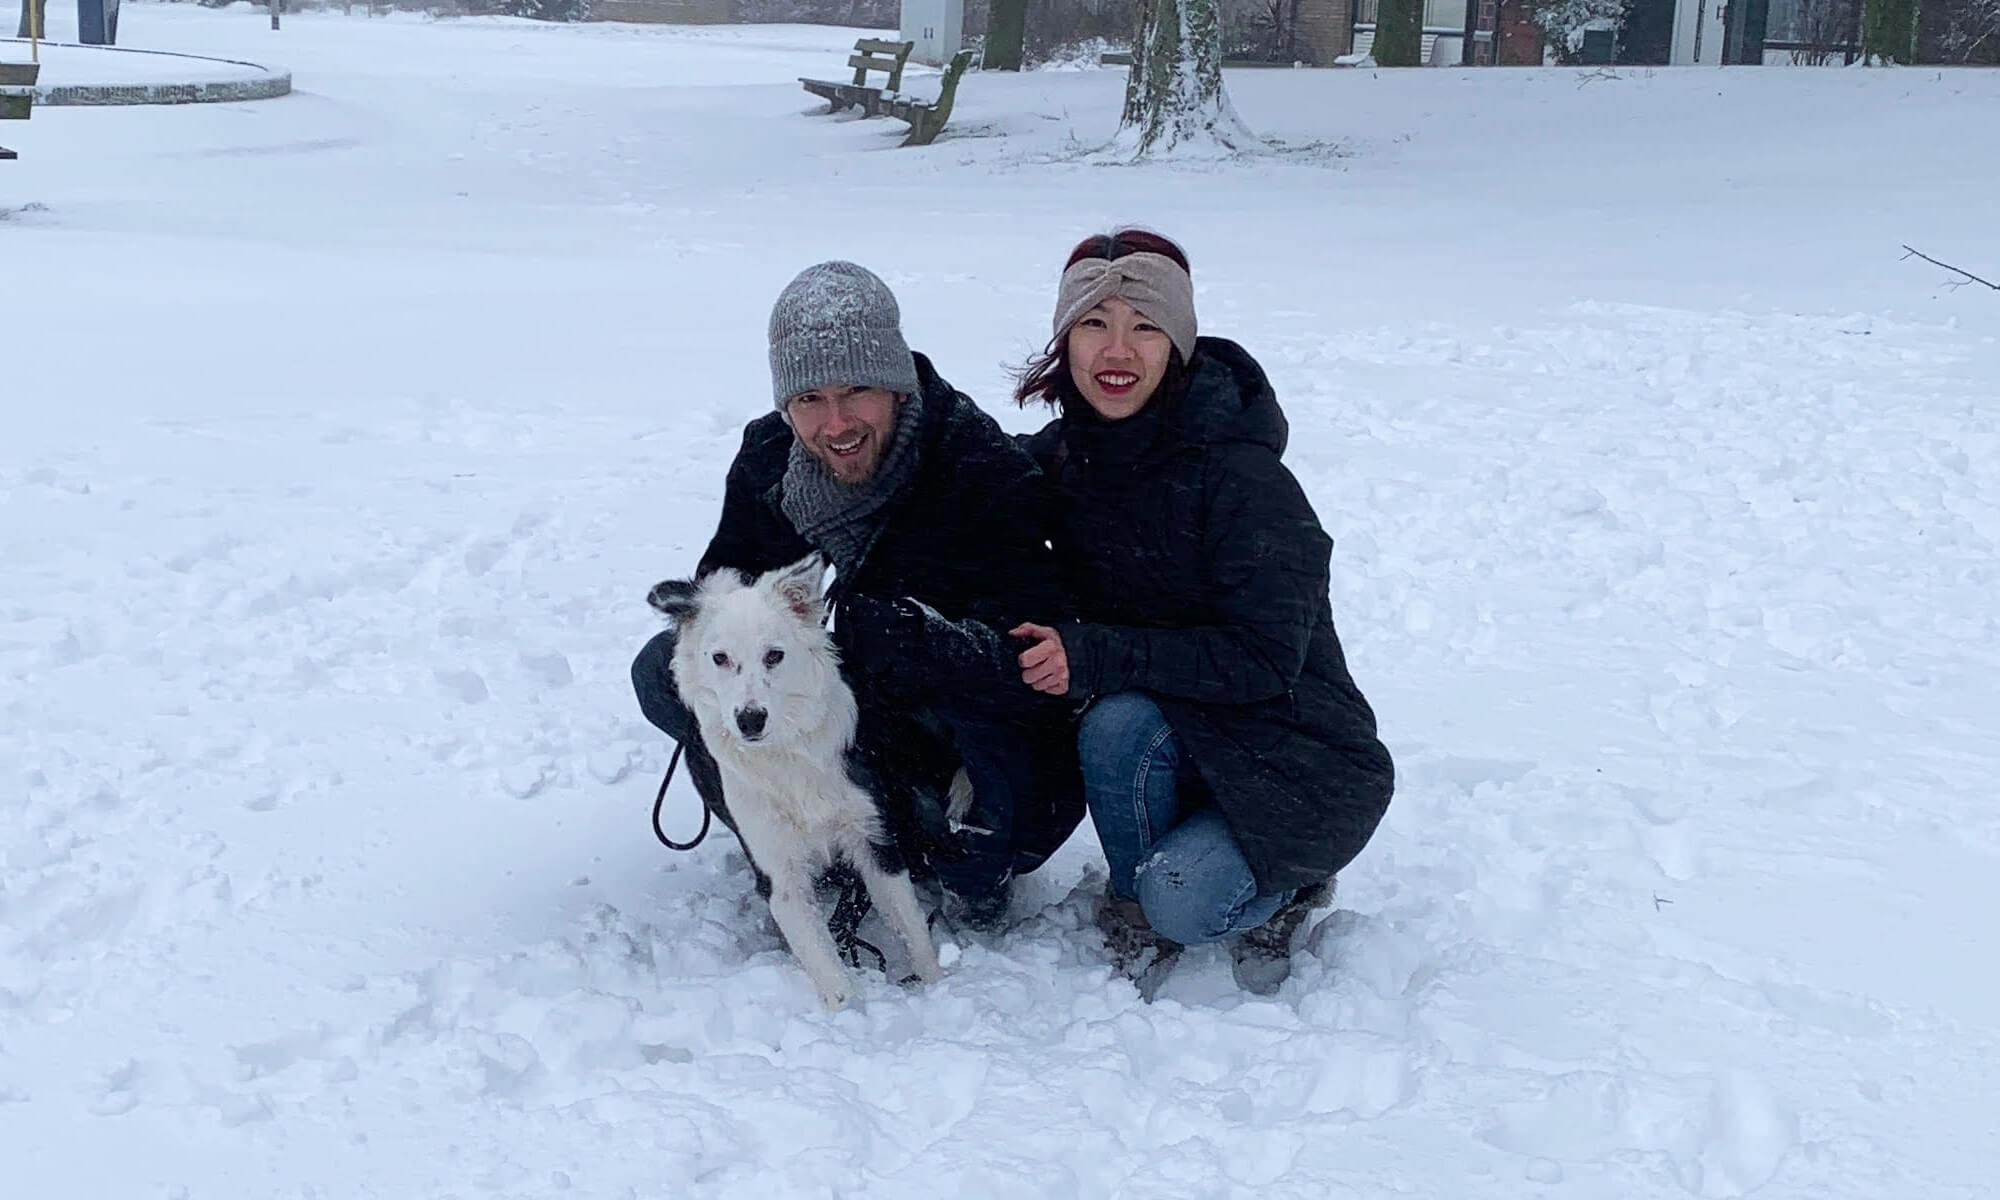 Snow and ice fun!